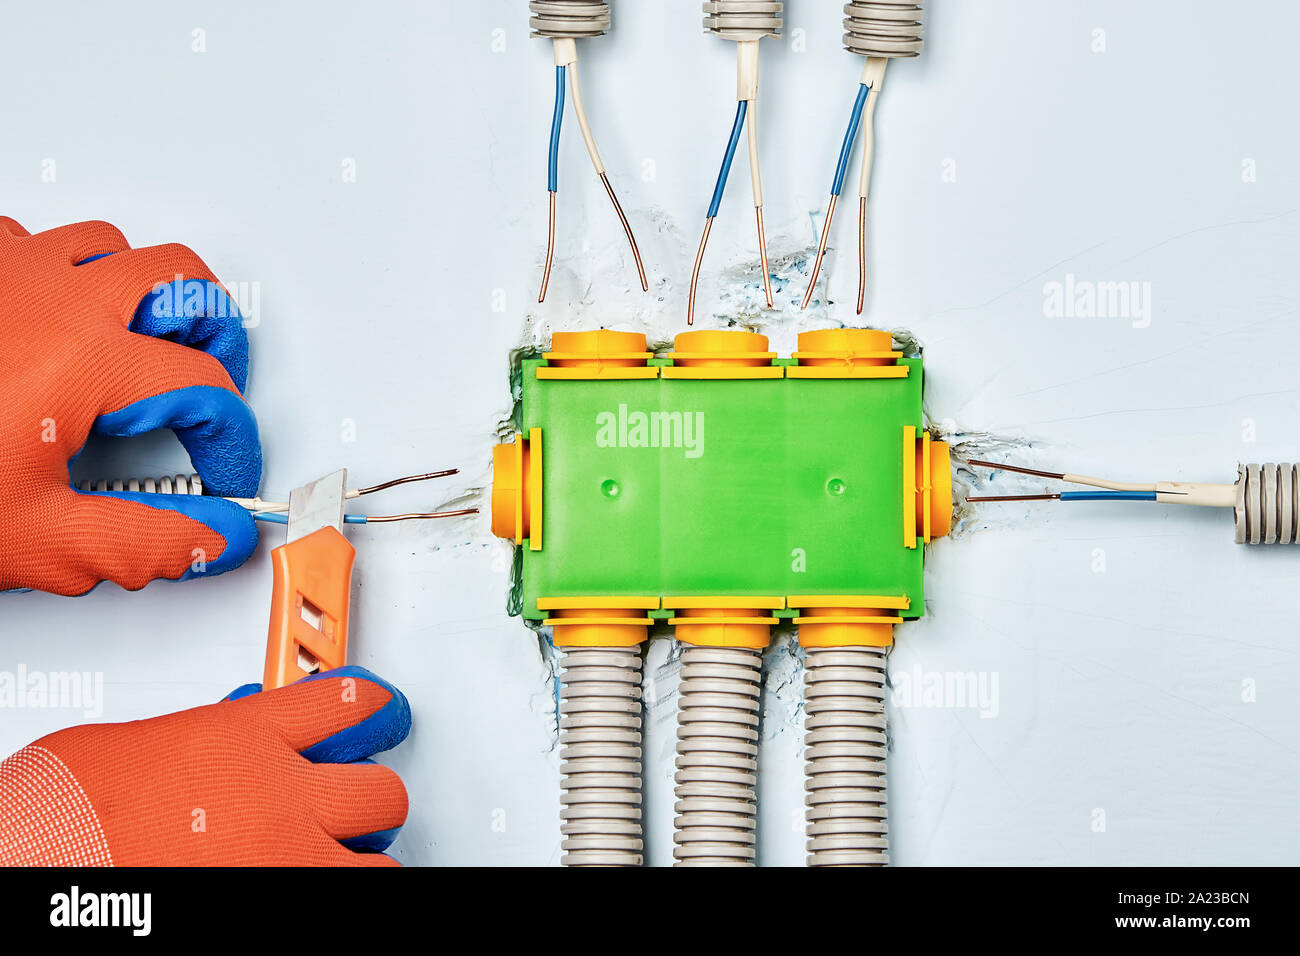 Electrical Conduit Stock Photos & Electrical Conduit Stock ... on